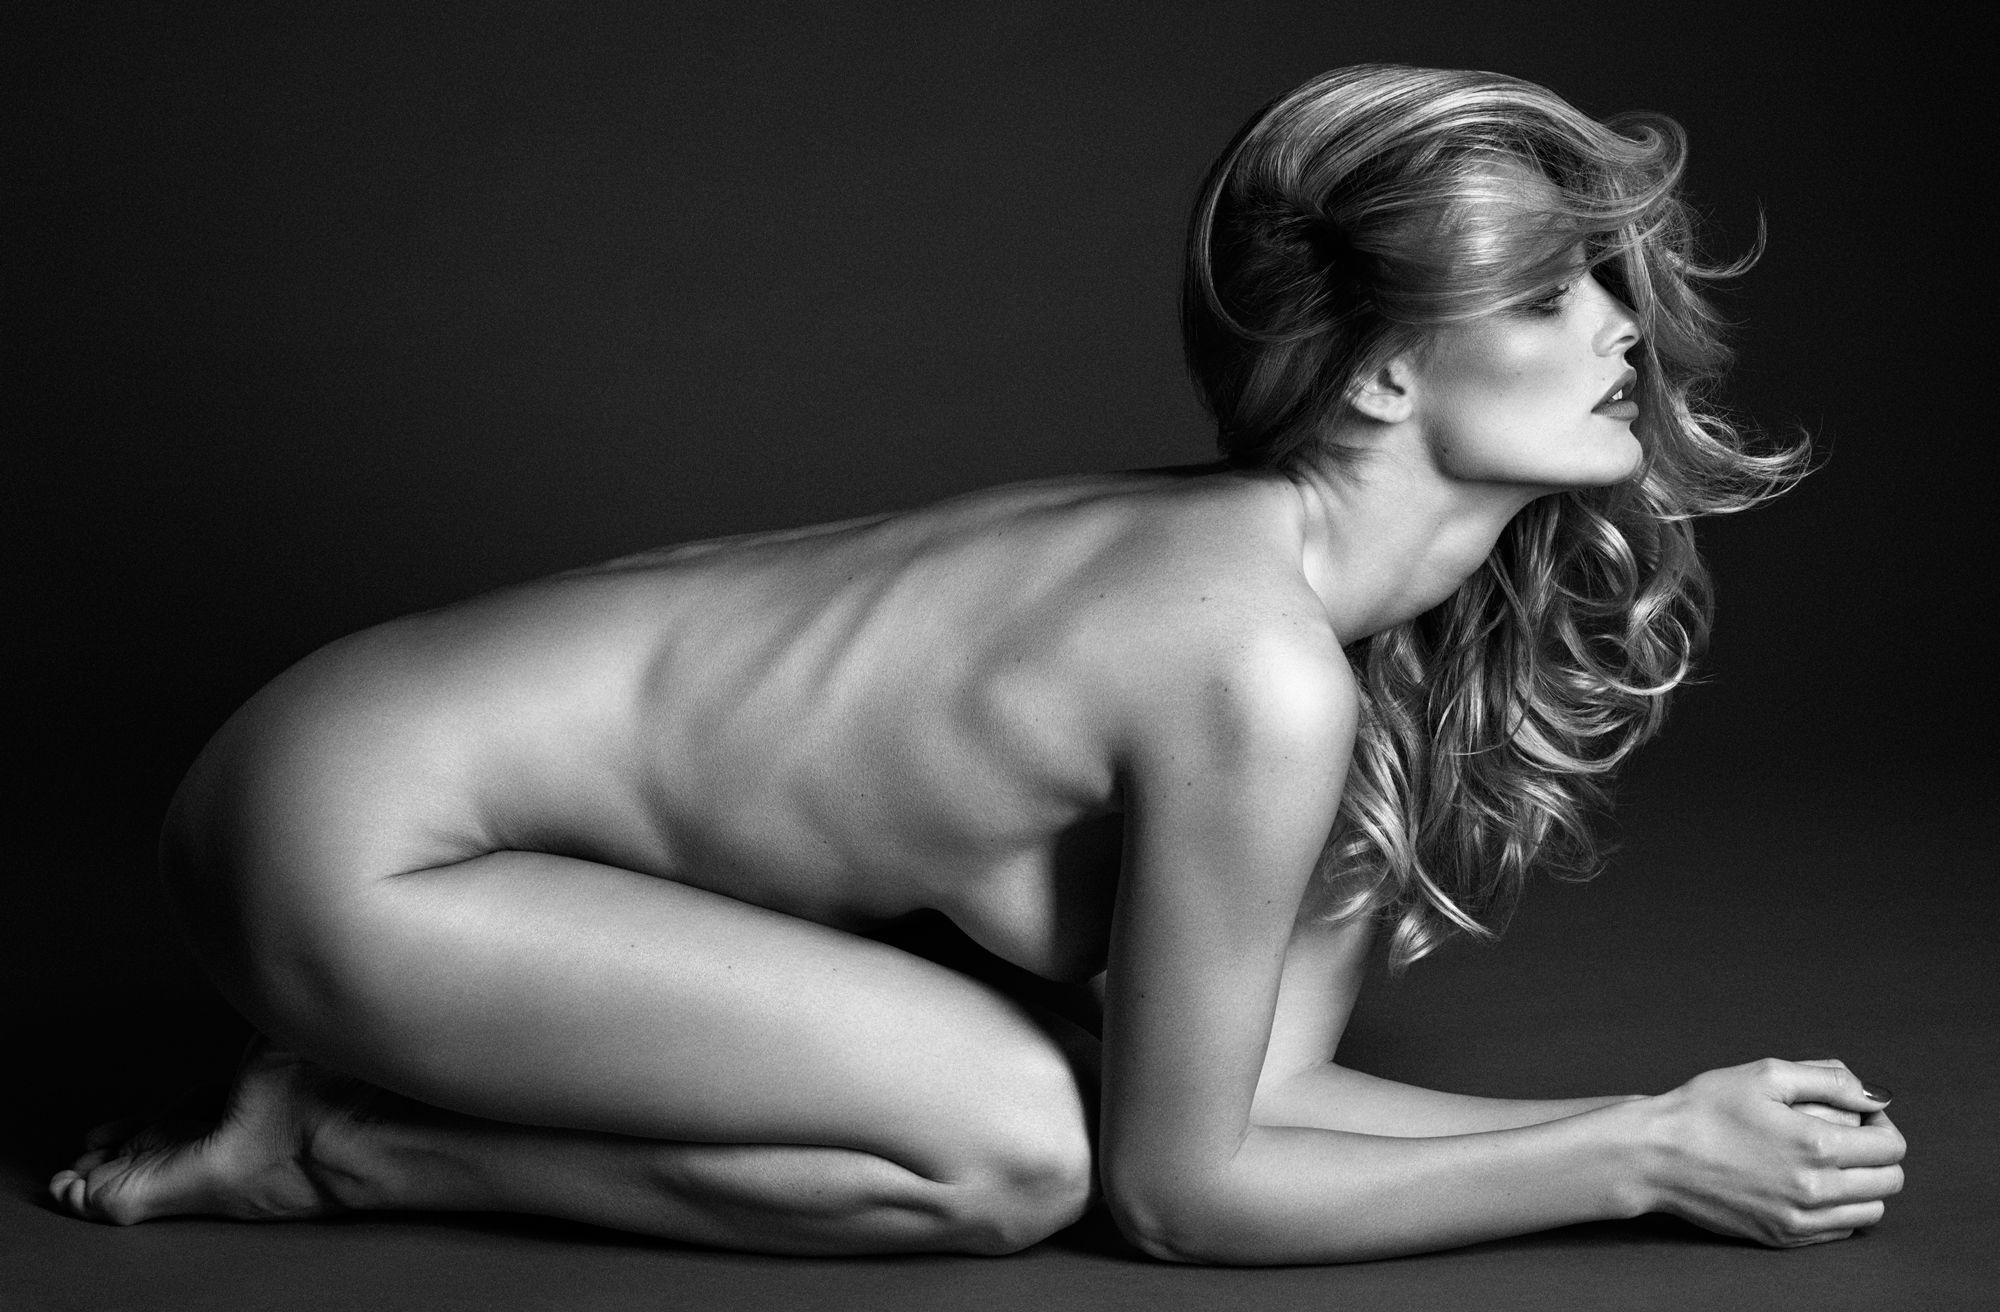 Календарь Pirelli 2012 эротика Эдита Вилкевичуте